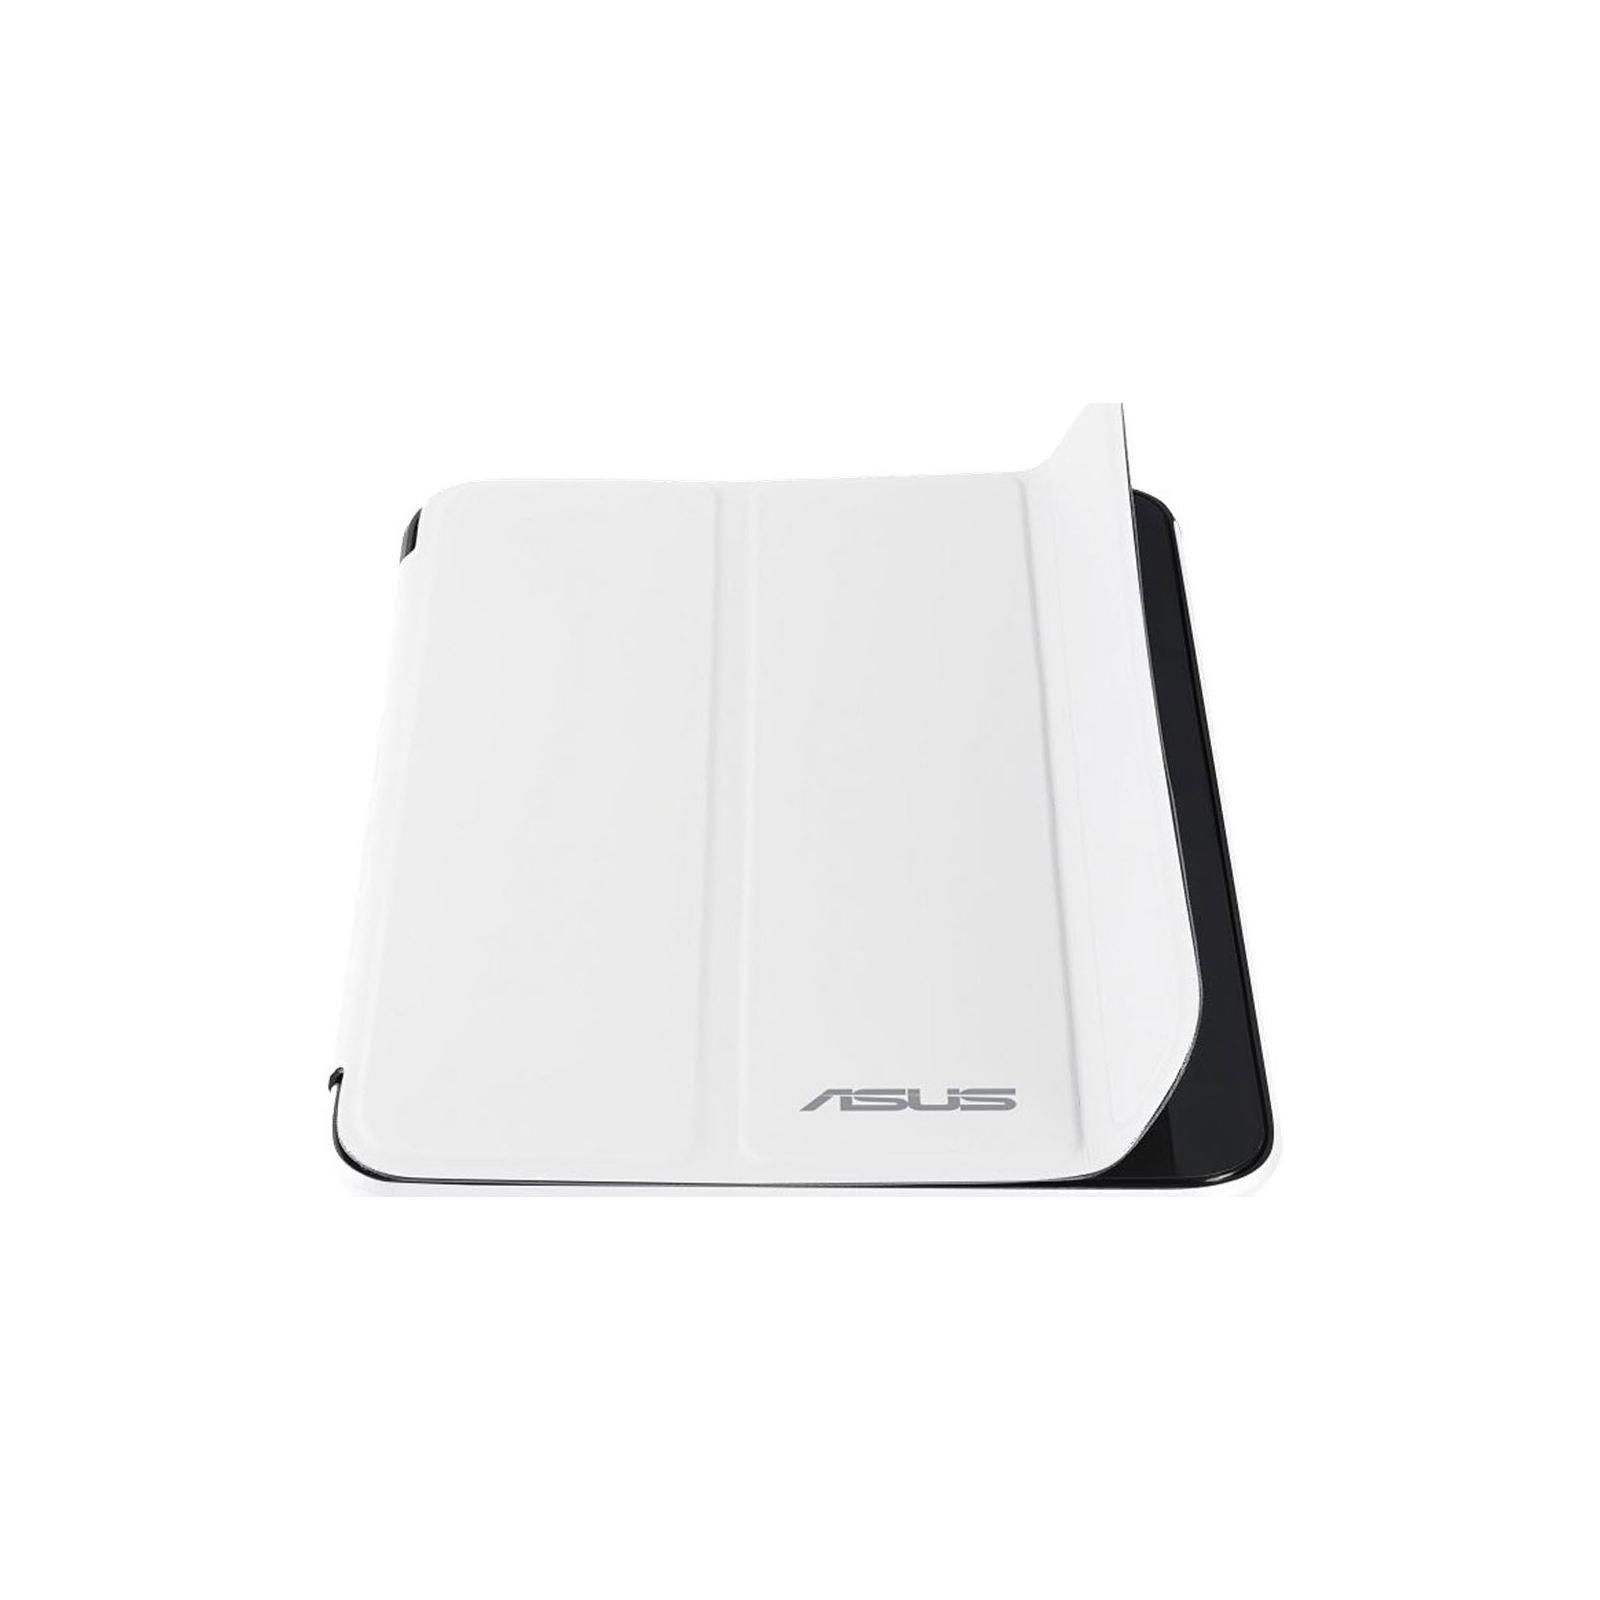 Чехол для планшета ASUS 8 ME180A TriCover WHITE (90XB015P-BSL0D0) изображение 3